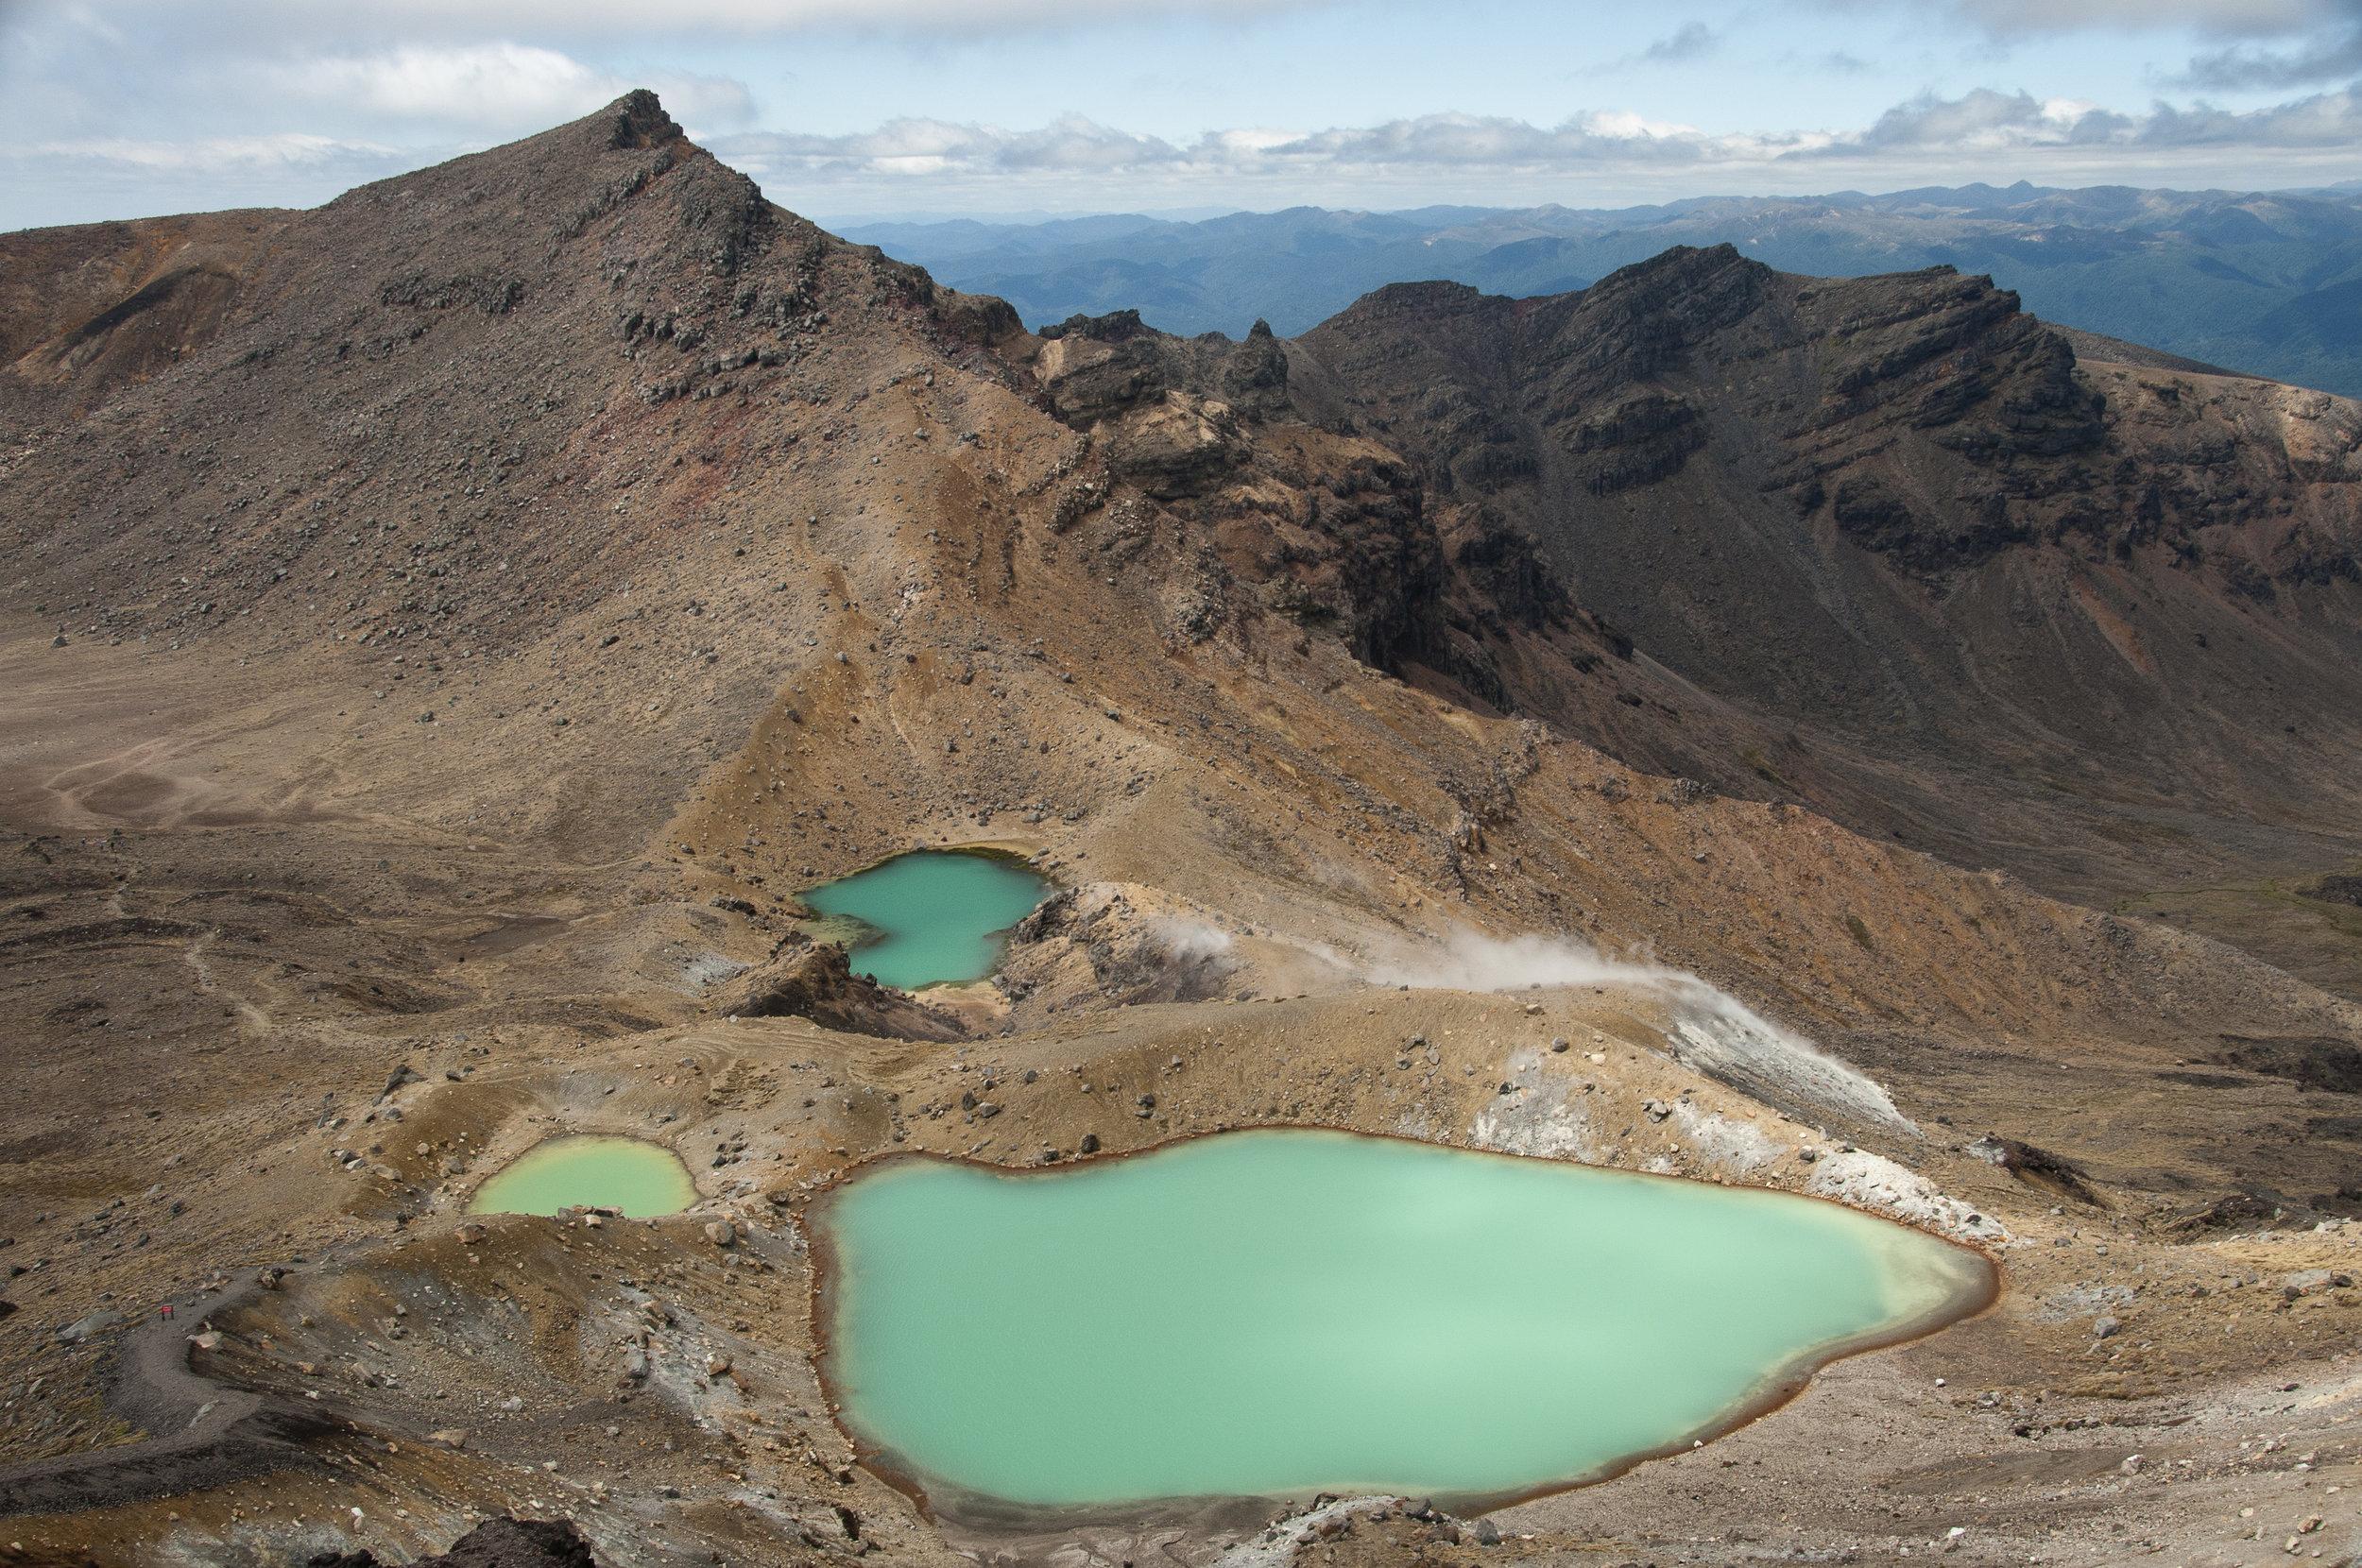 New Zealand North Island Mount Tongariro Lake-Daniel Noll 2013-IMG1012 Lg RGB.jpg